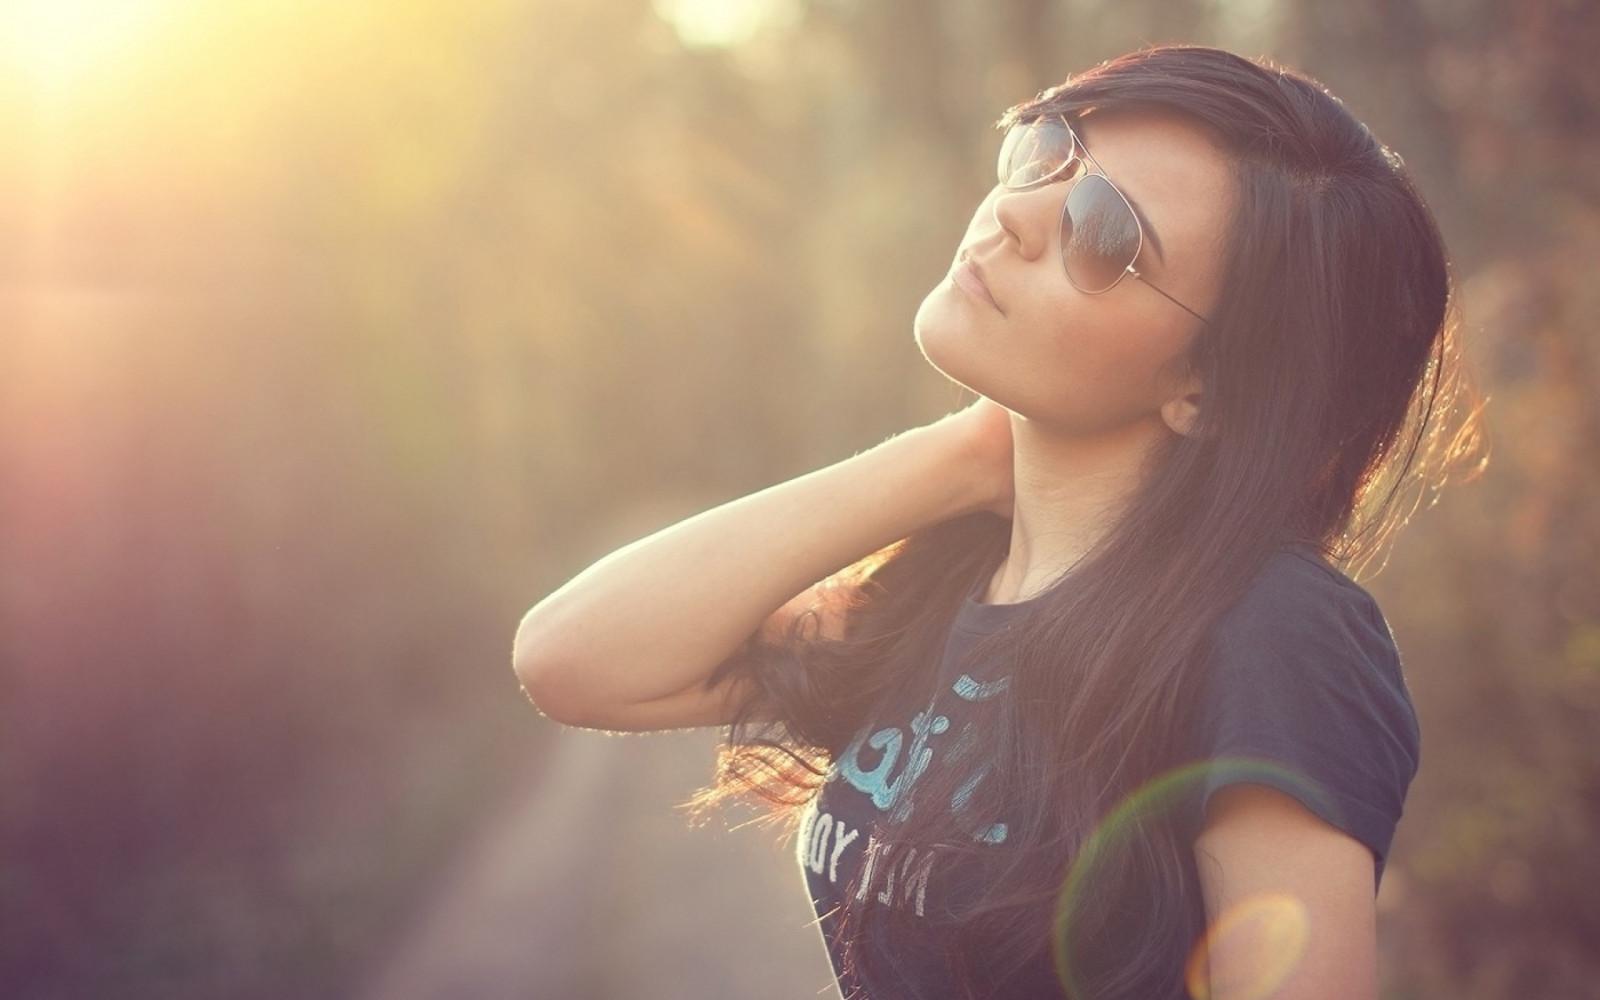 Фото девушек брюнеток в профиль на аву в